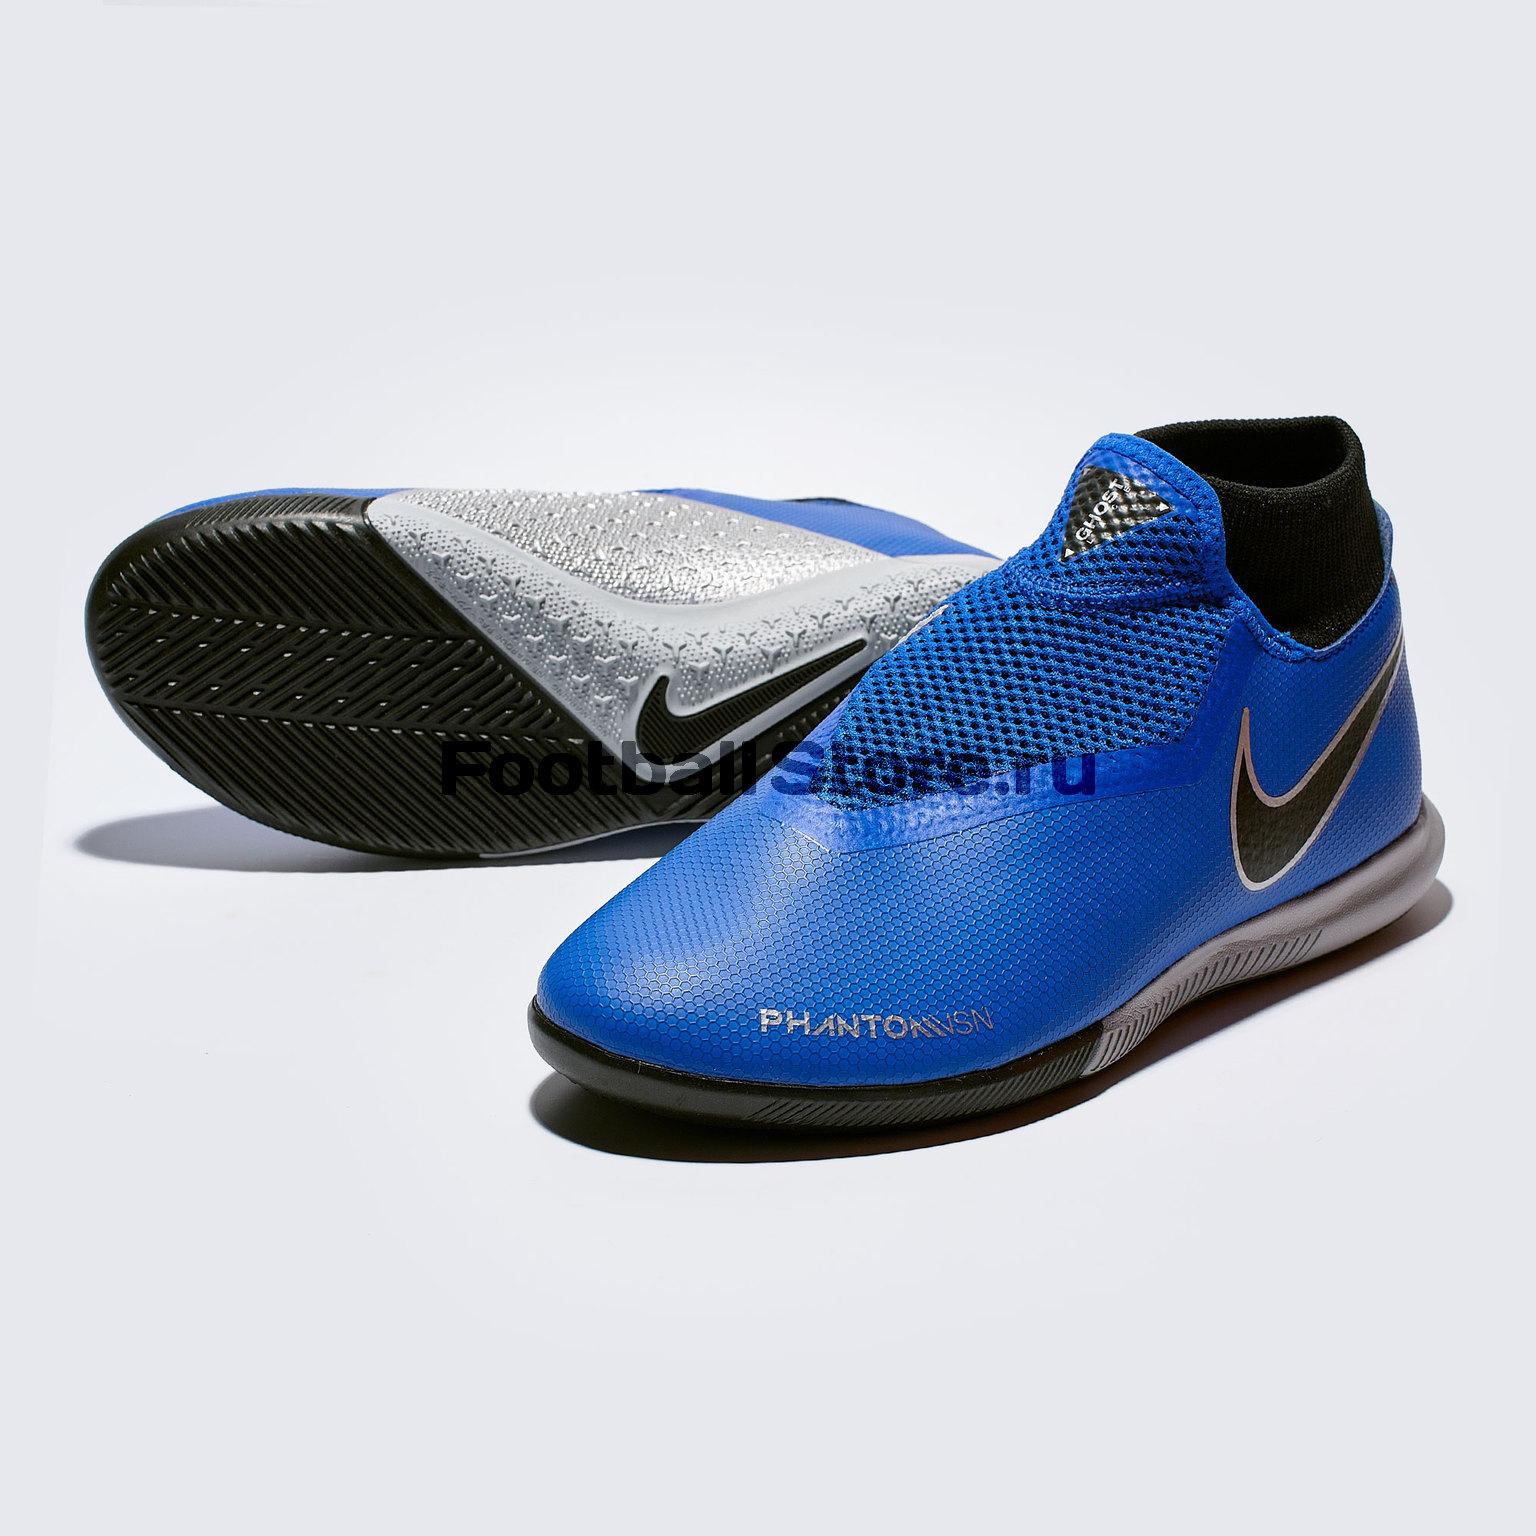 Футзалки Nike Phantom Vision Academy DF IC AO3267-400 футзалки детские nike phantom vision academy df ic ao3290 004